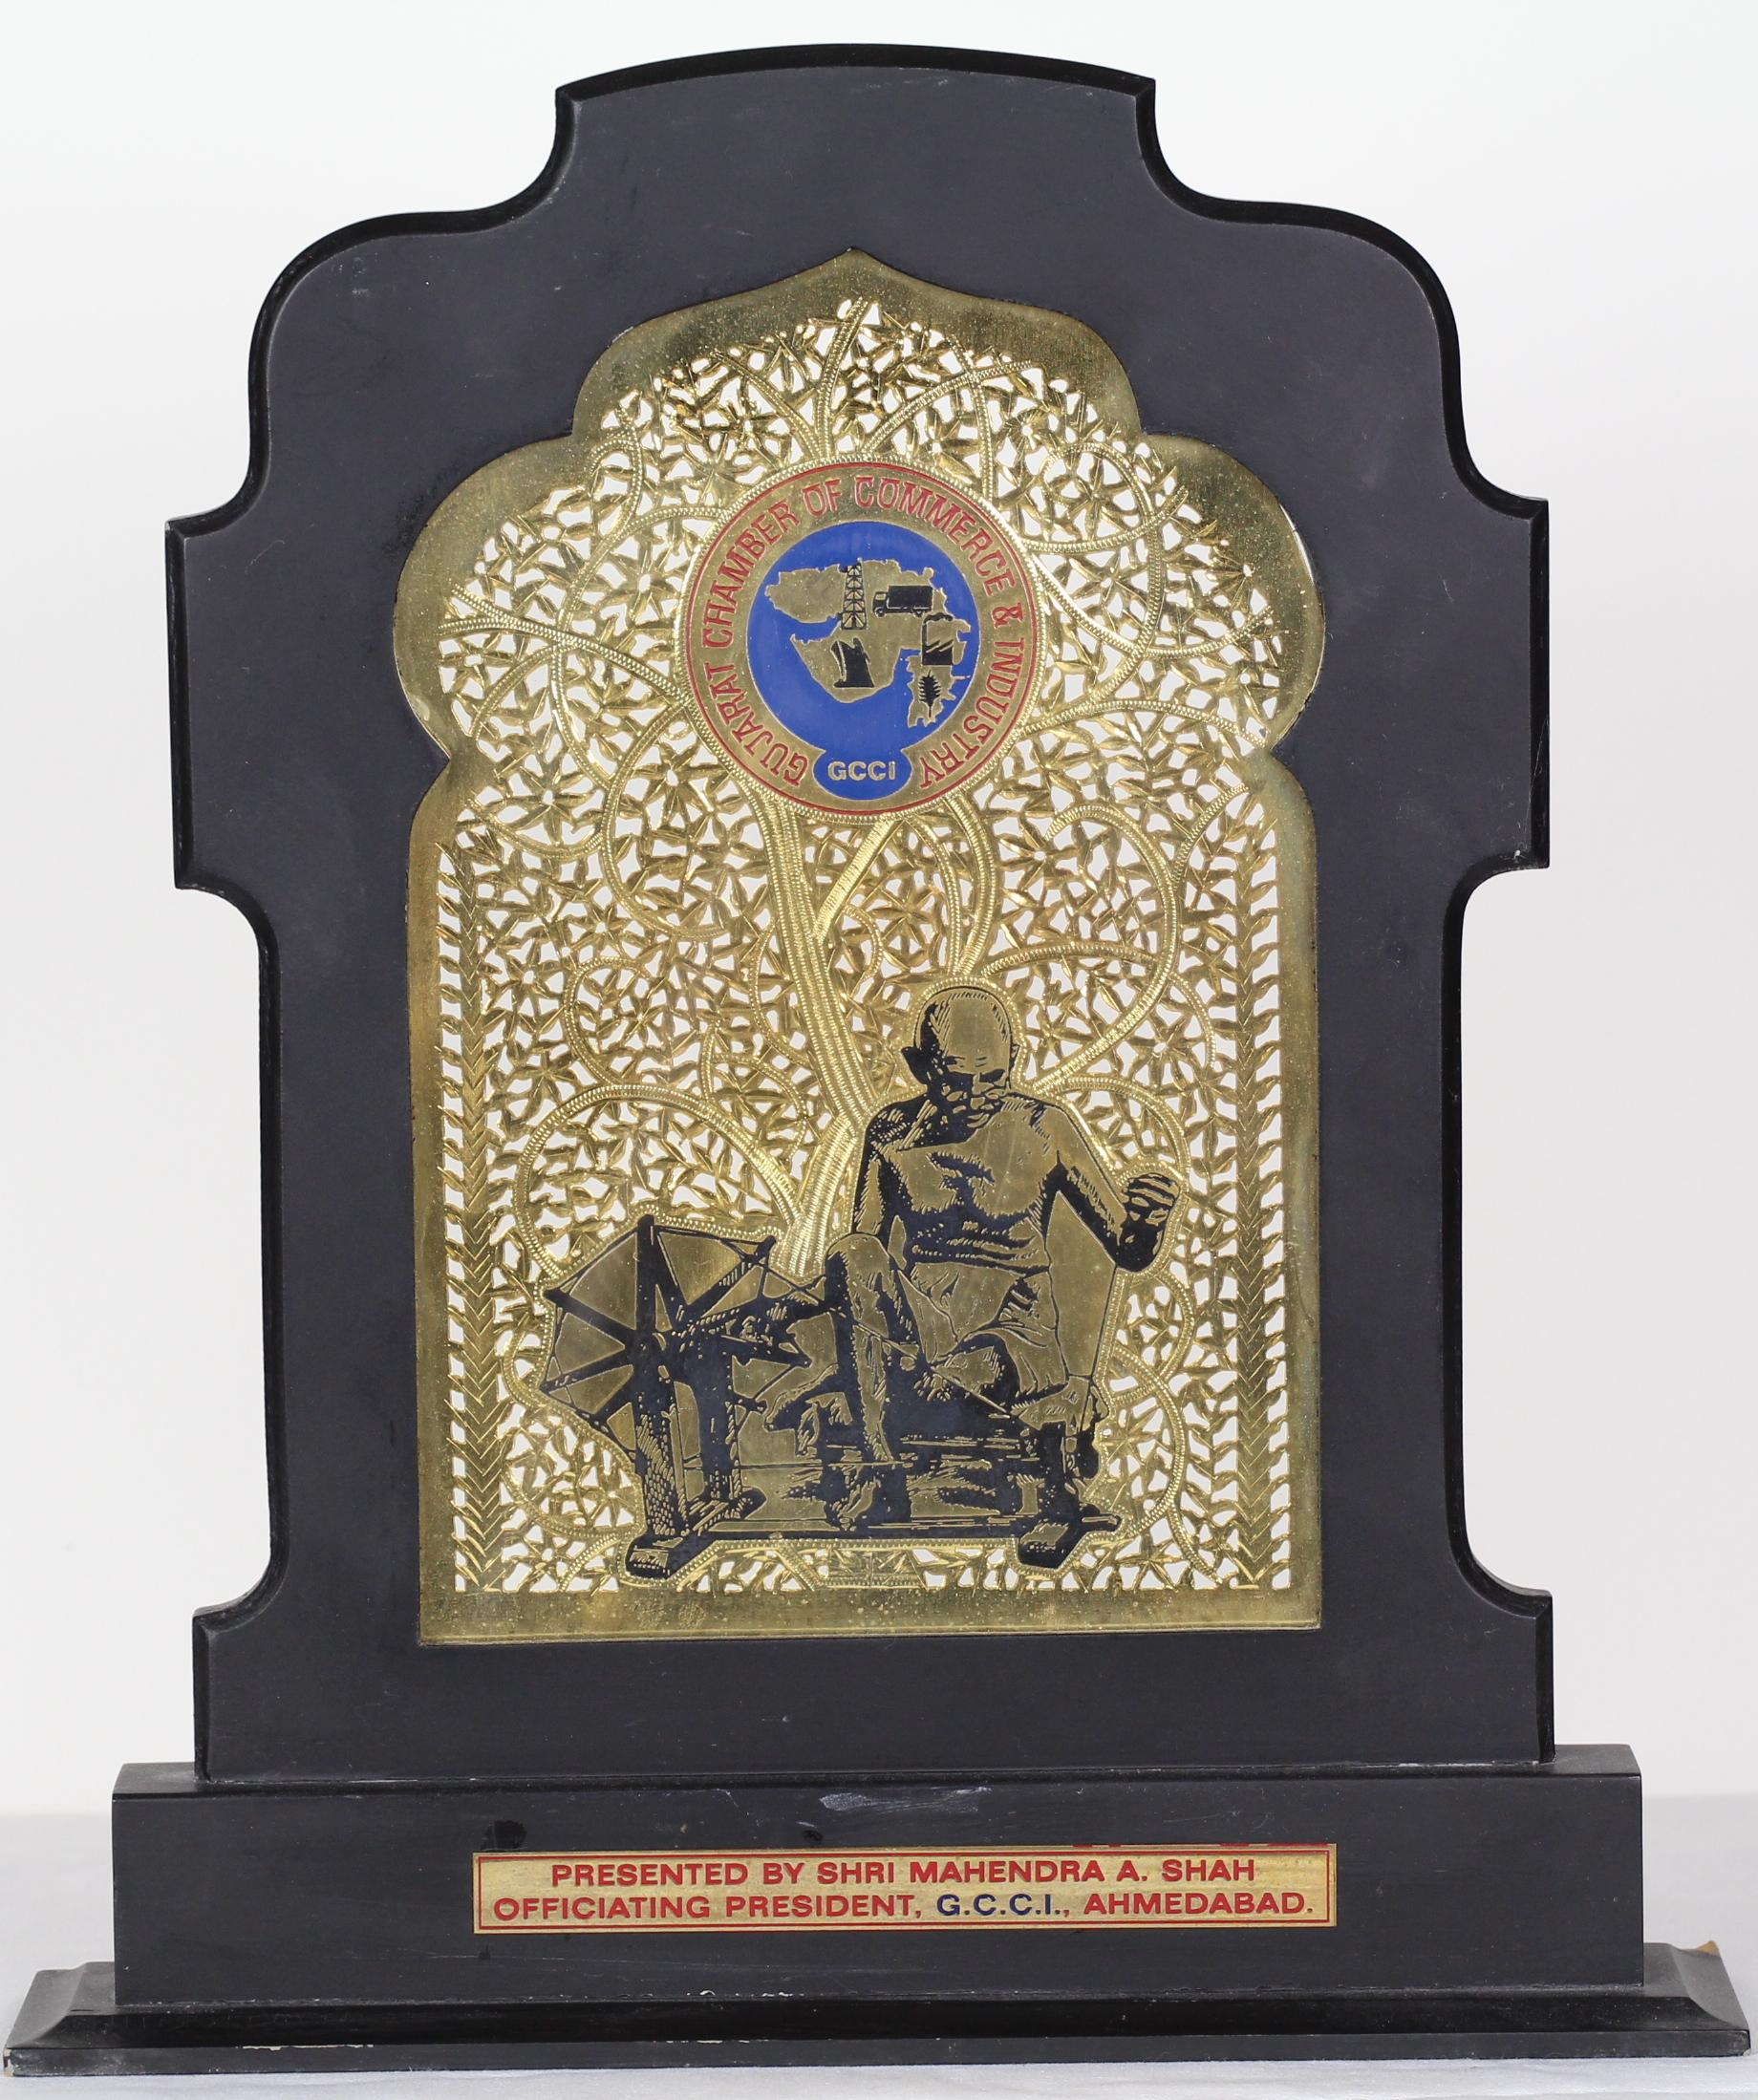 Award of Appreciation from Shri Mahendra A. Shah, Officiating President, G. C. C. I., Ahmedabad